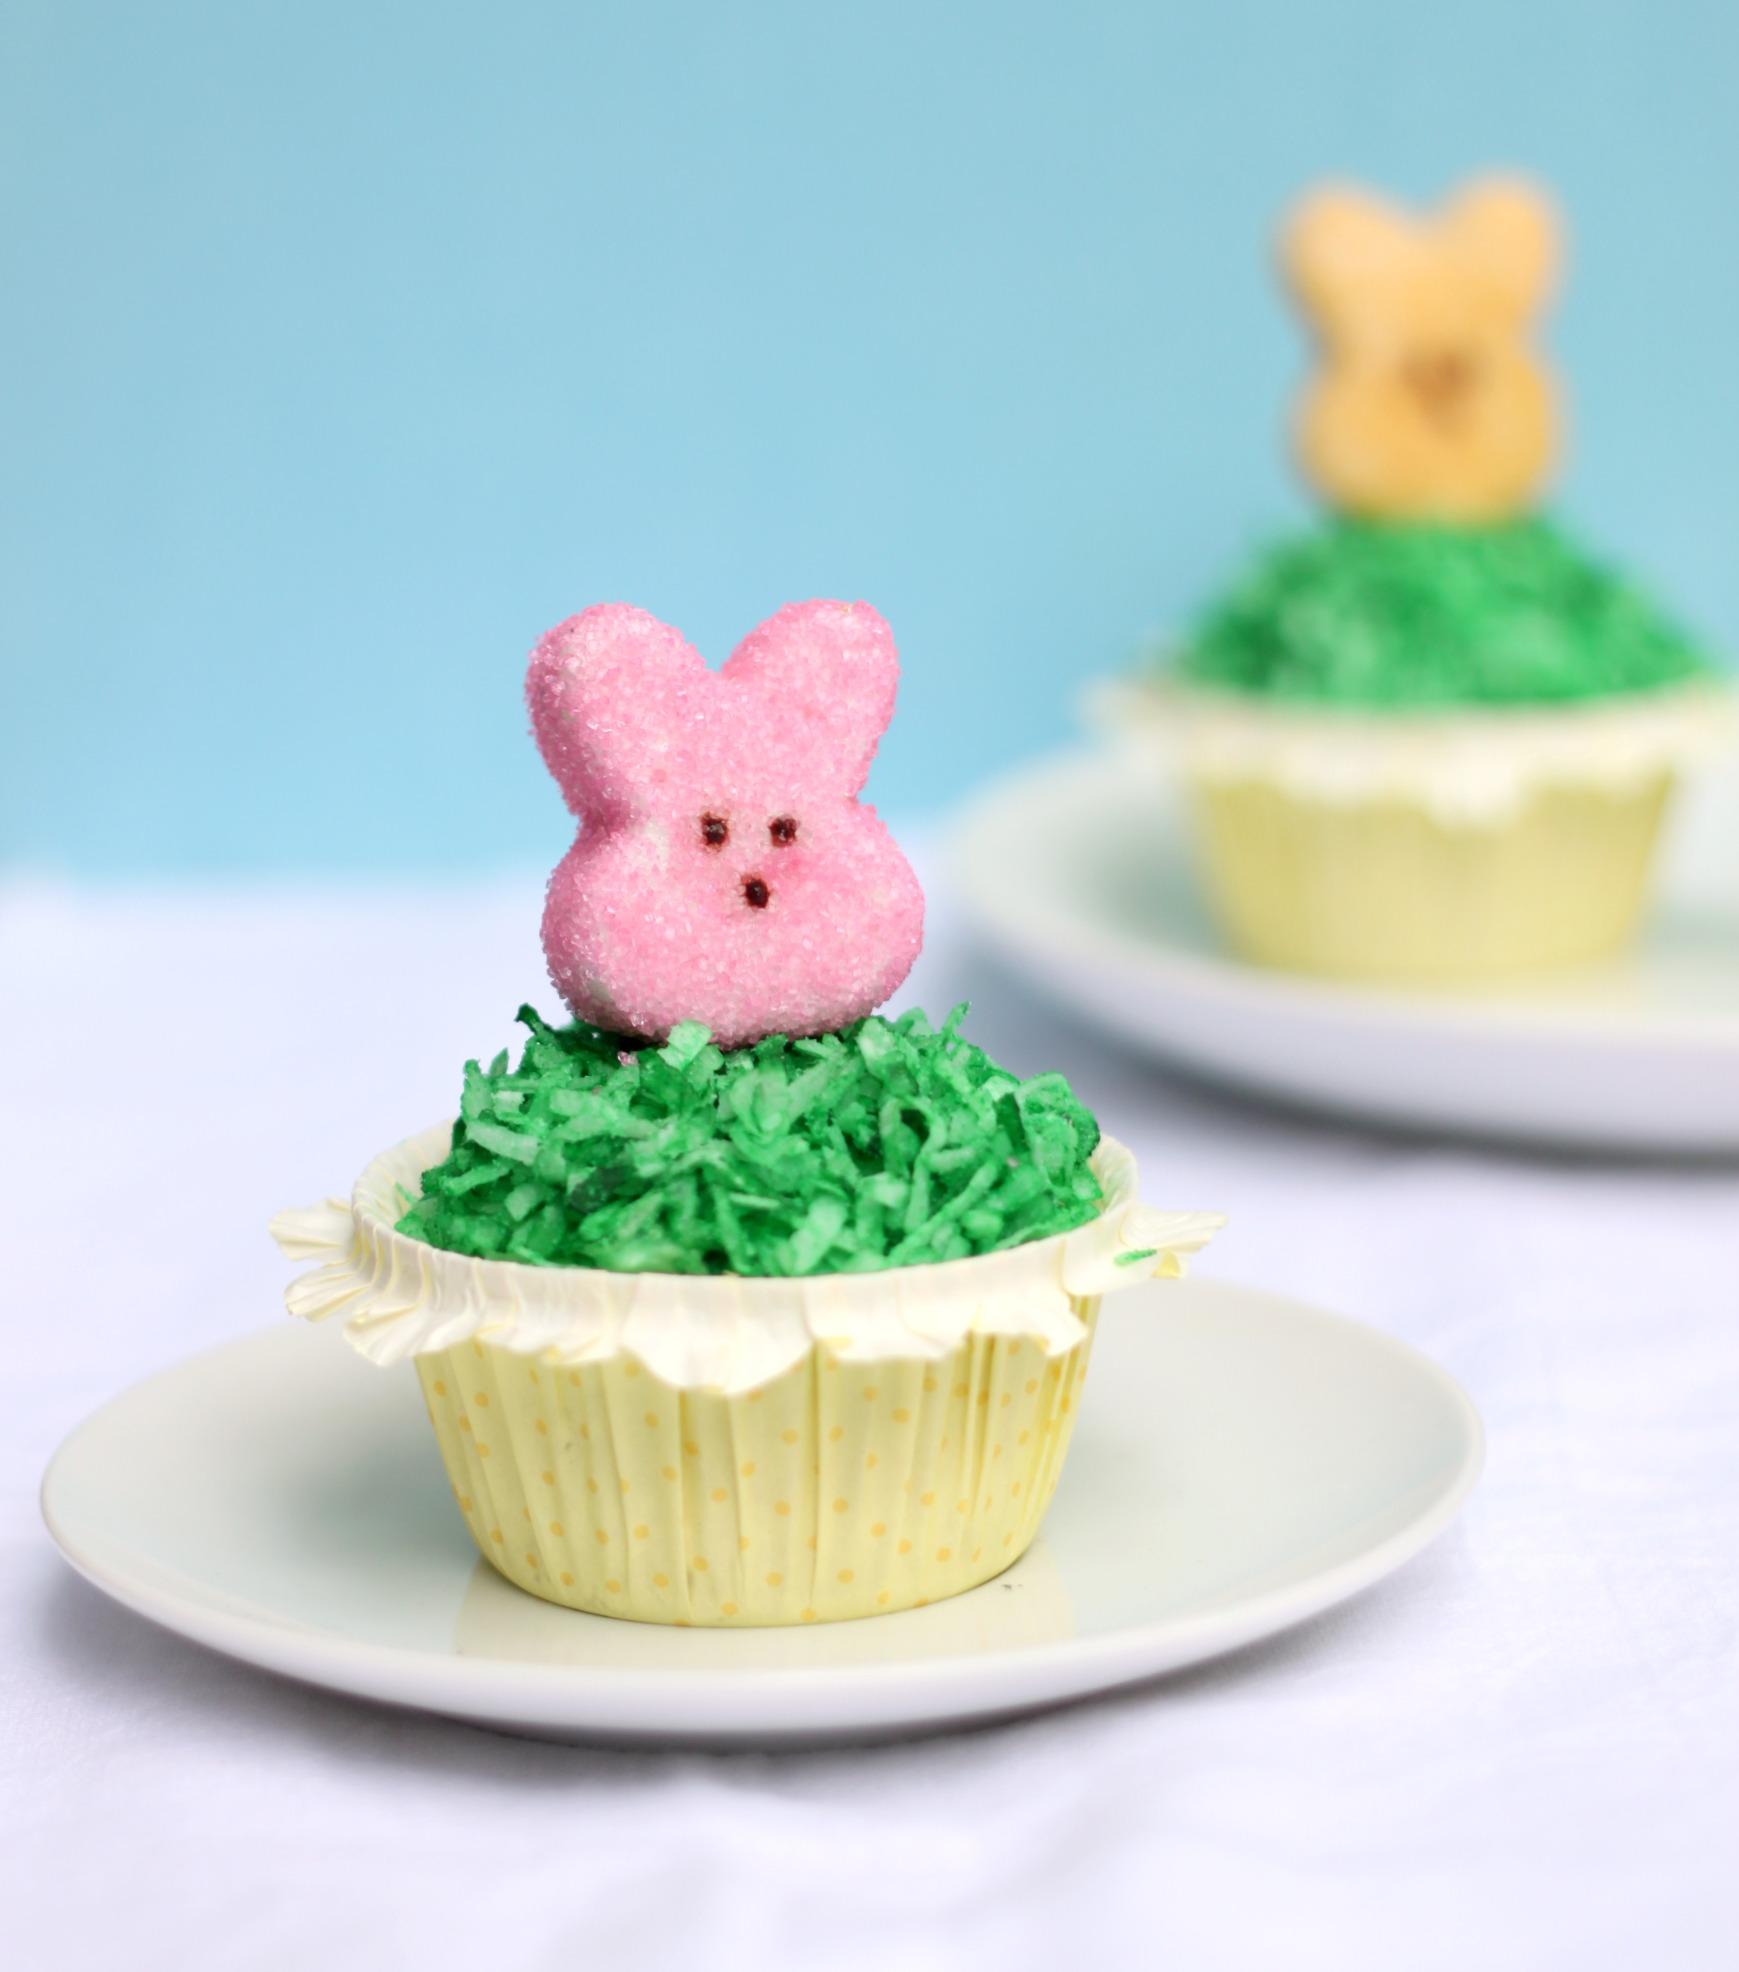 Cupcake with homemade pink marshmallow peep